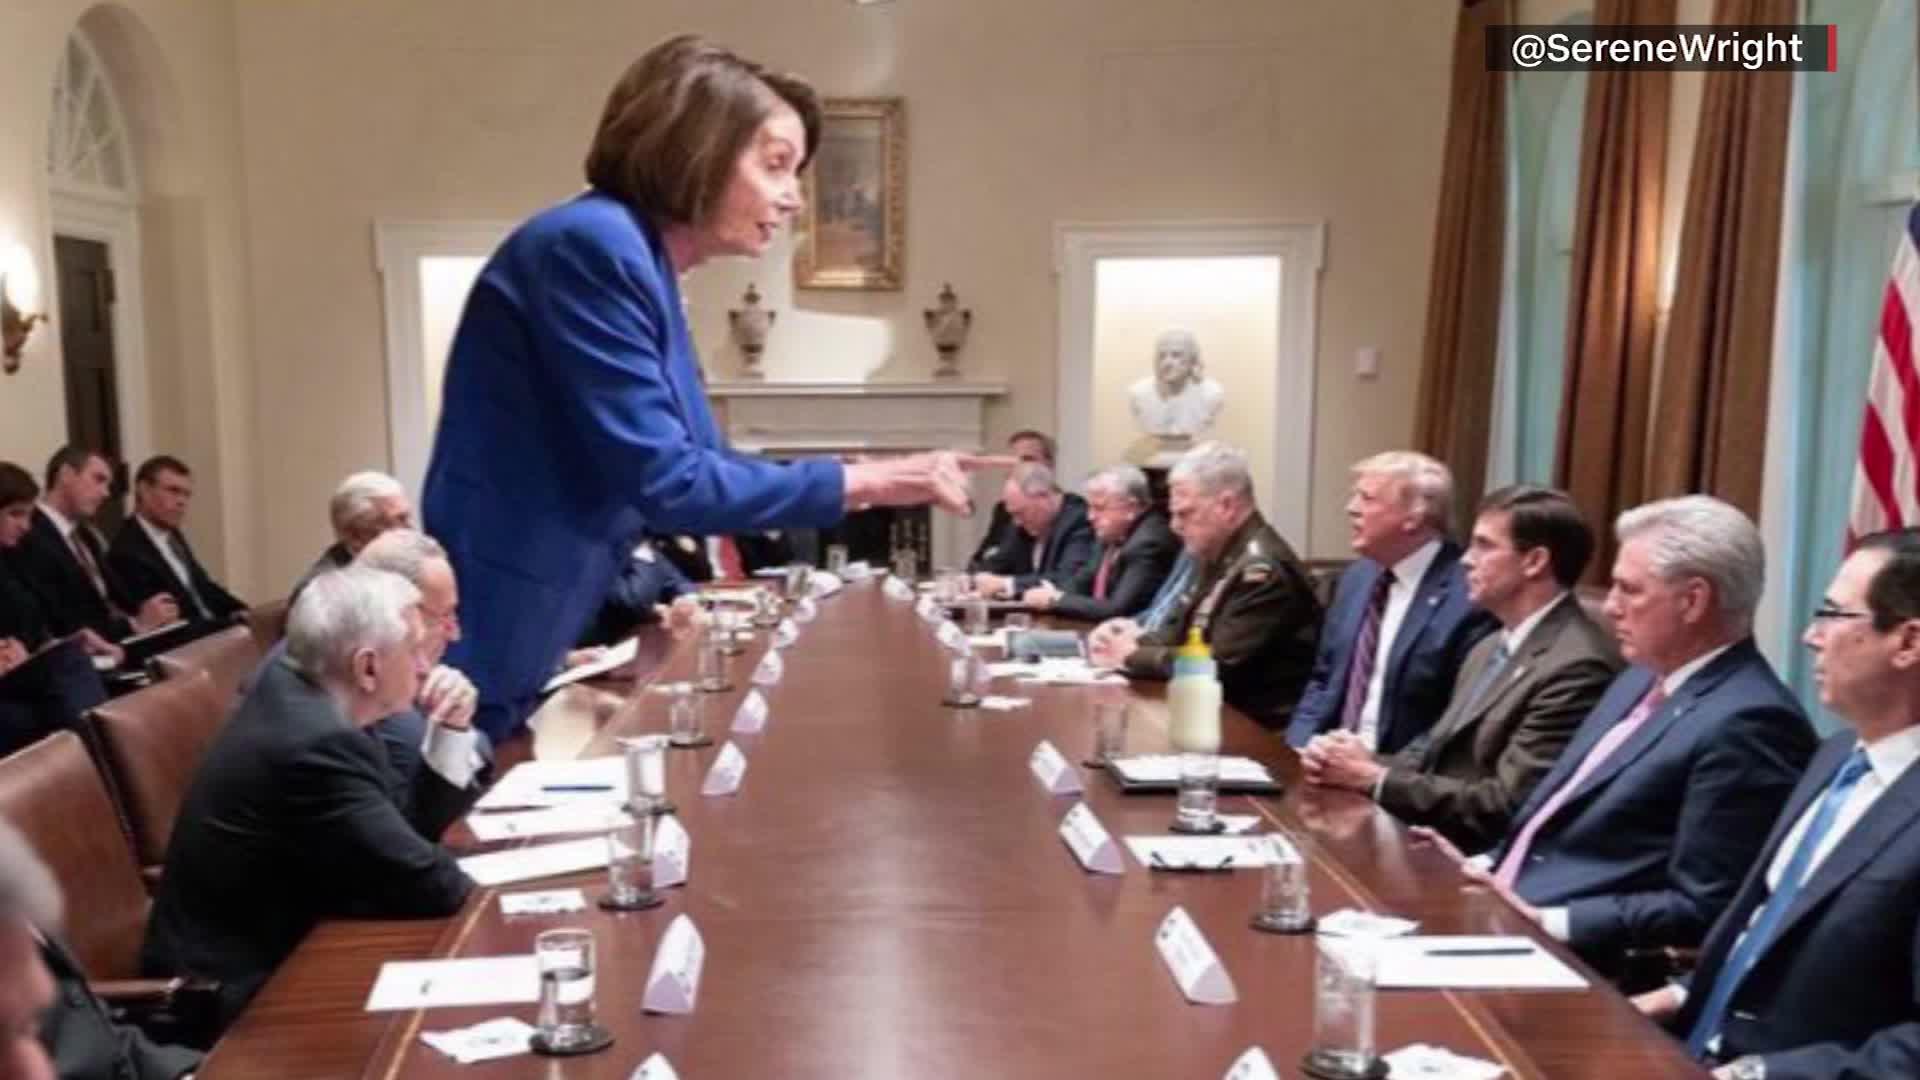 Internet melts down over Nancy Pelosi photo from Trump meeting - CNN Video